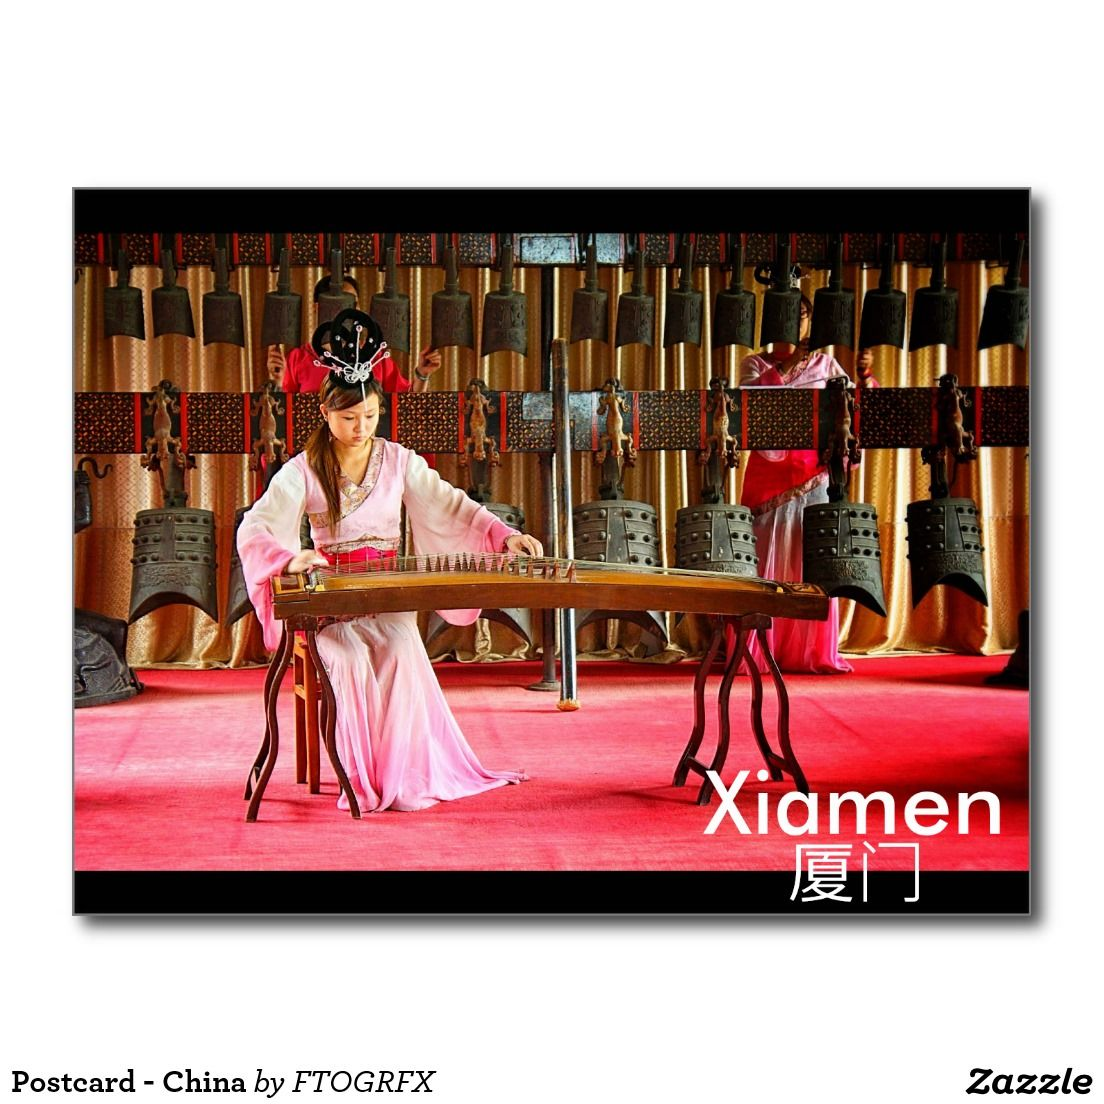 Postcard - China